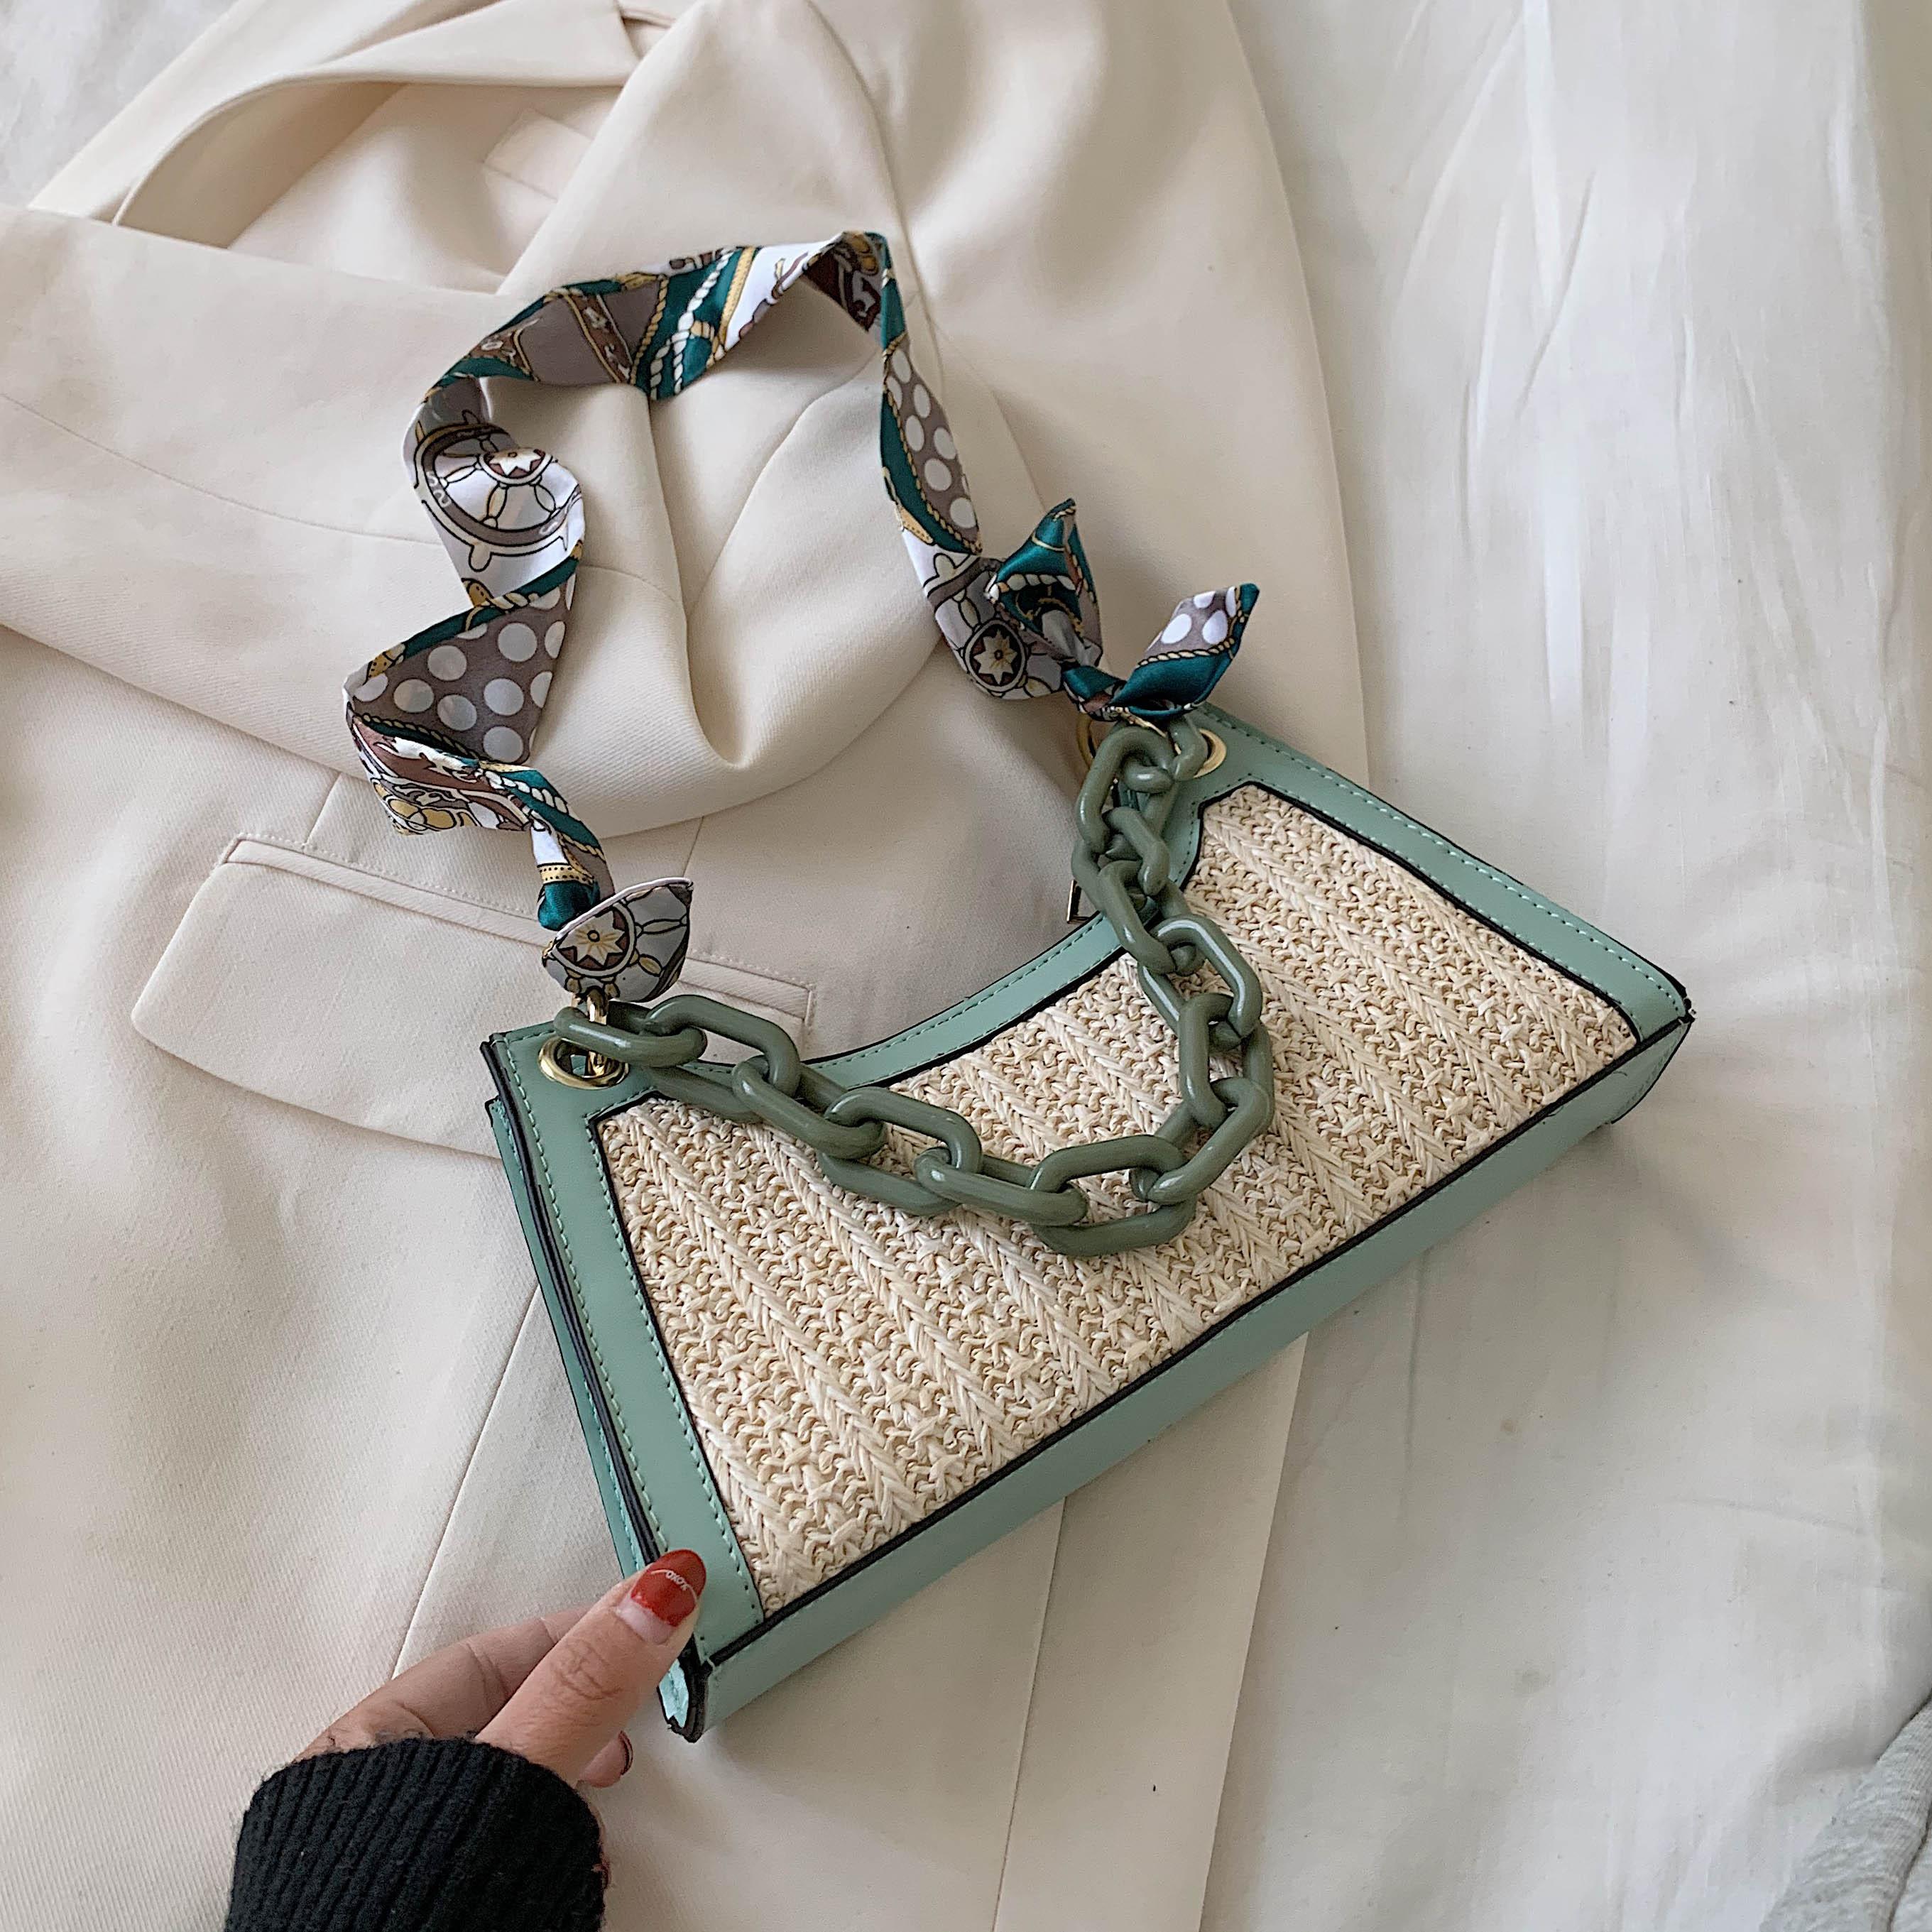 Summer Straw Bags For Women 2020 Scarf Design Crossbody Shoulder Bag Female Handbags Lady Cute Chain Travel Beach Totes